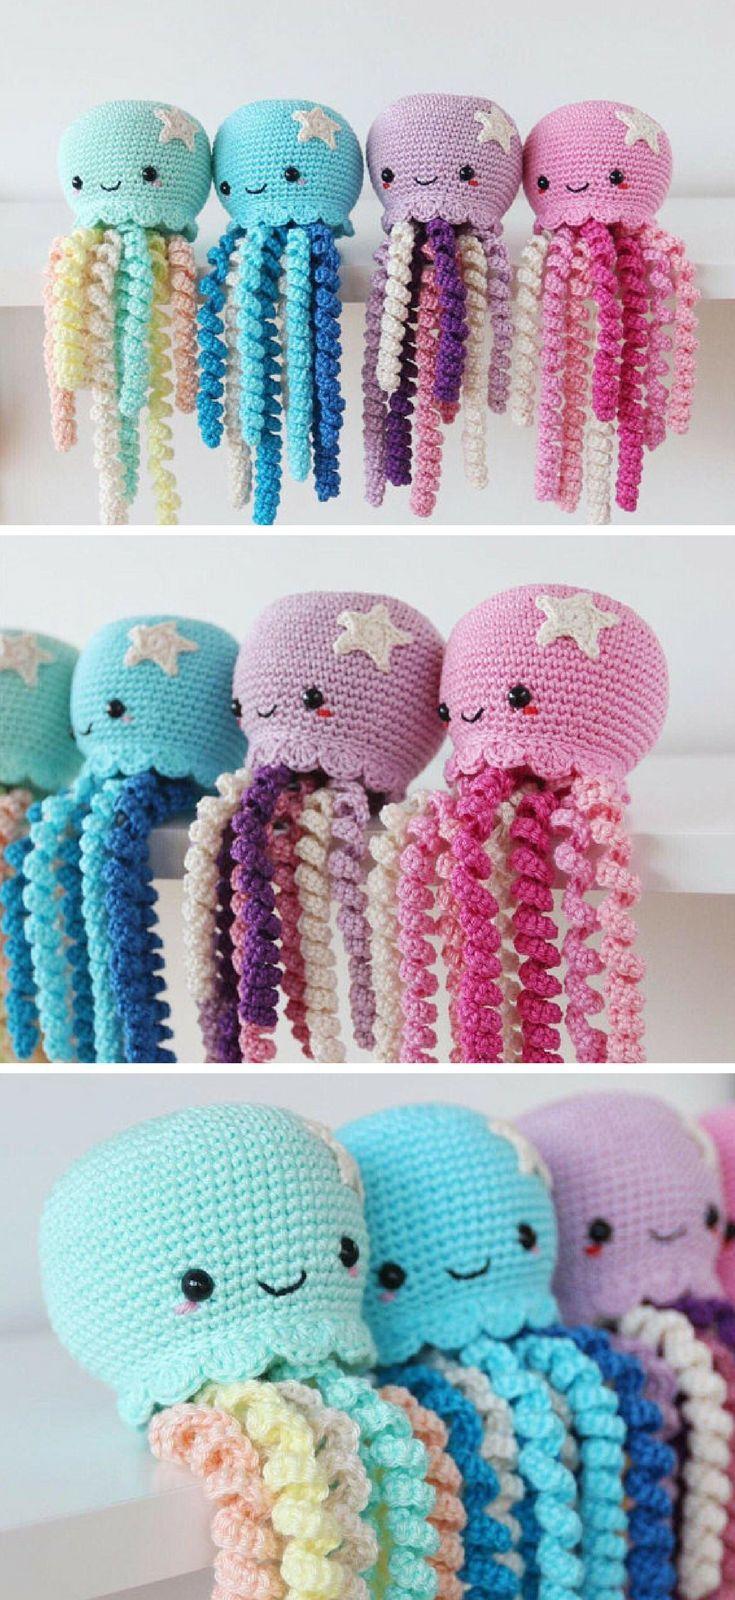 Amigurumi Octopus Crochet Pattern Printable PDF   Amigurumi Jellyfish Crochet Pa...